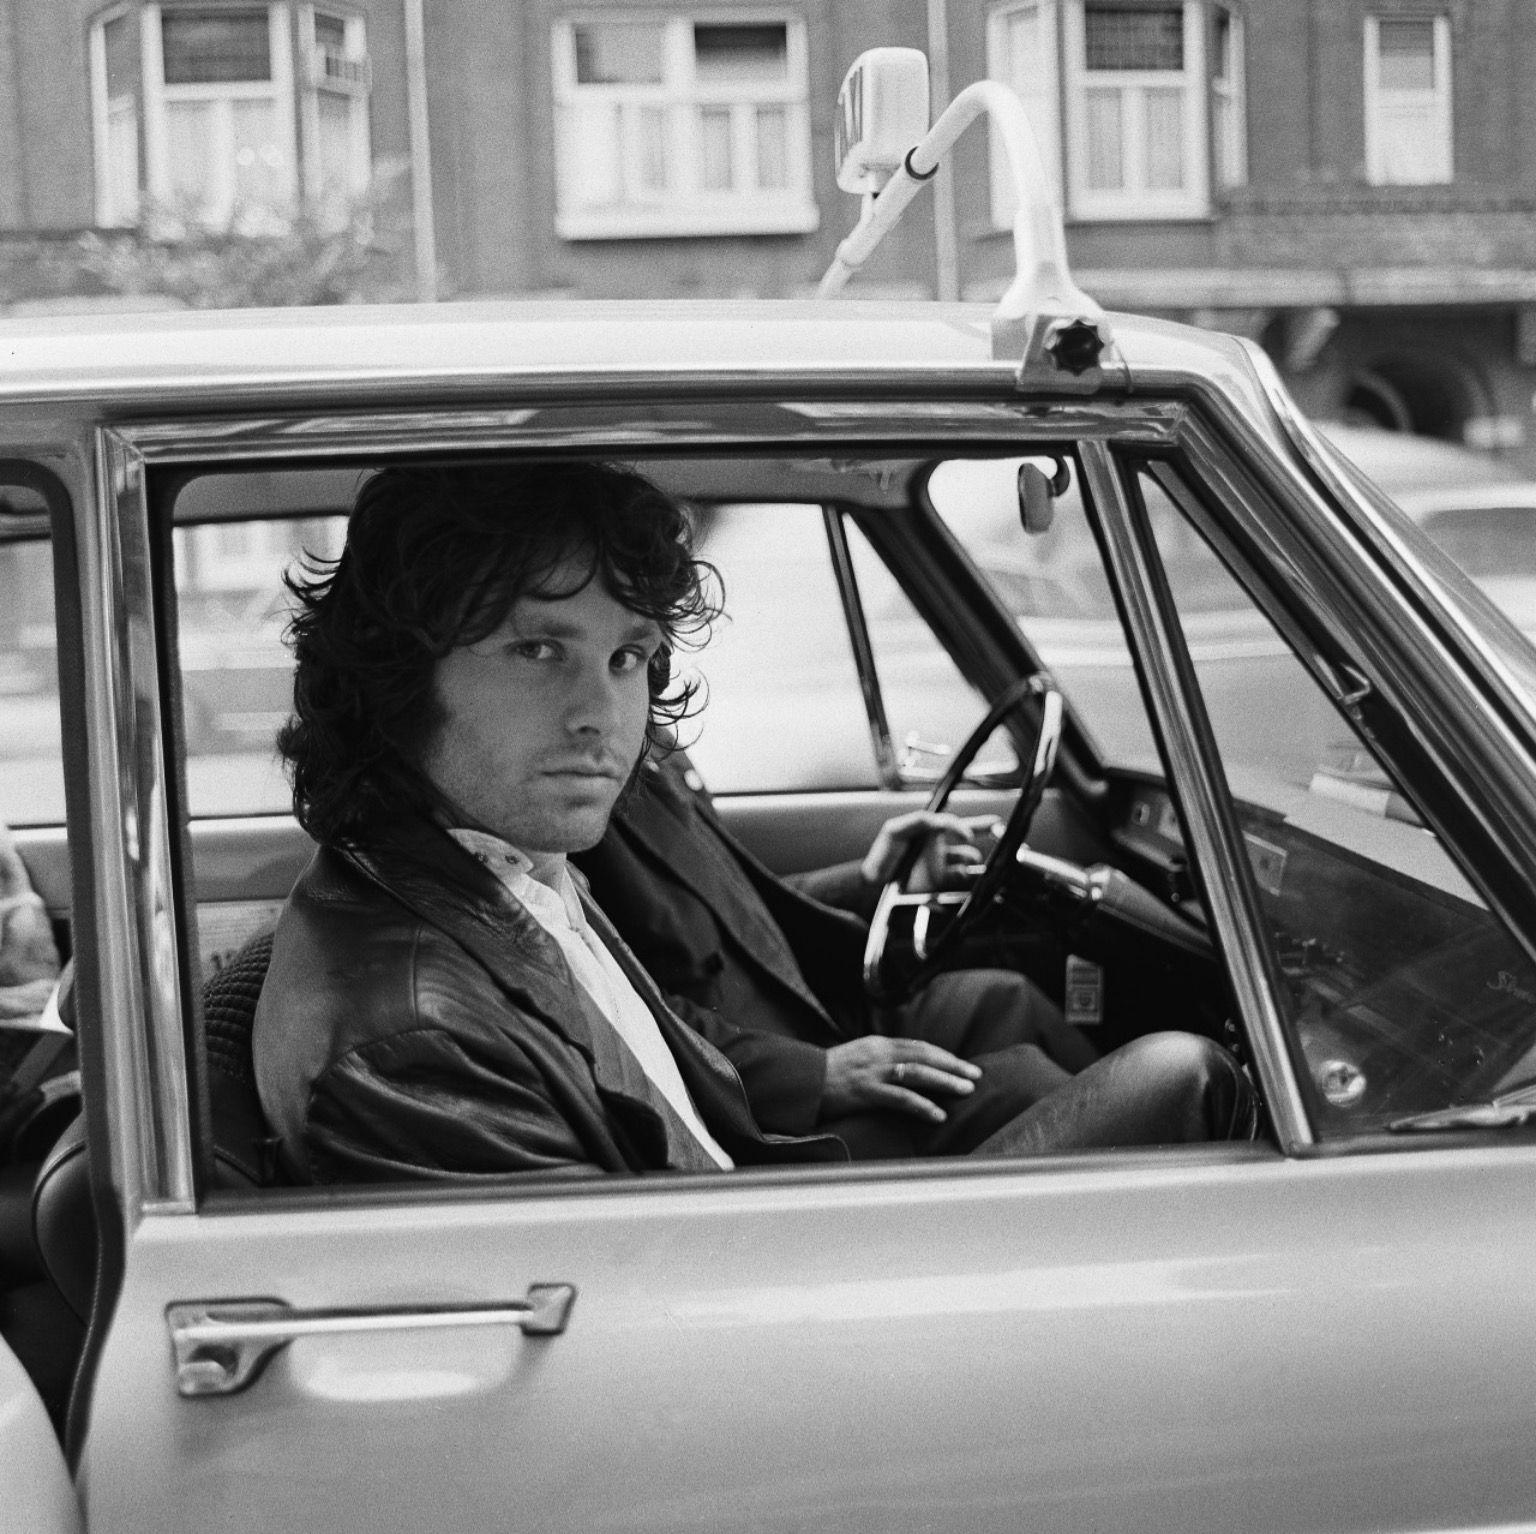 Jim Morrison in Amsterdam, 1968 © Nico van der Stam